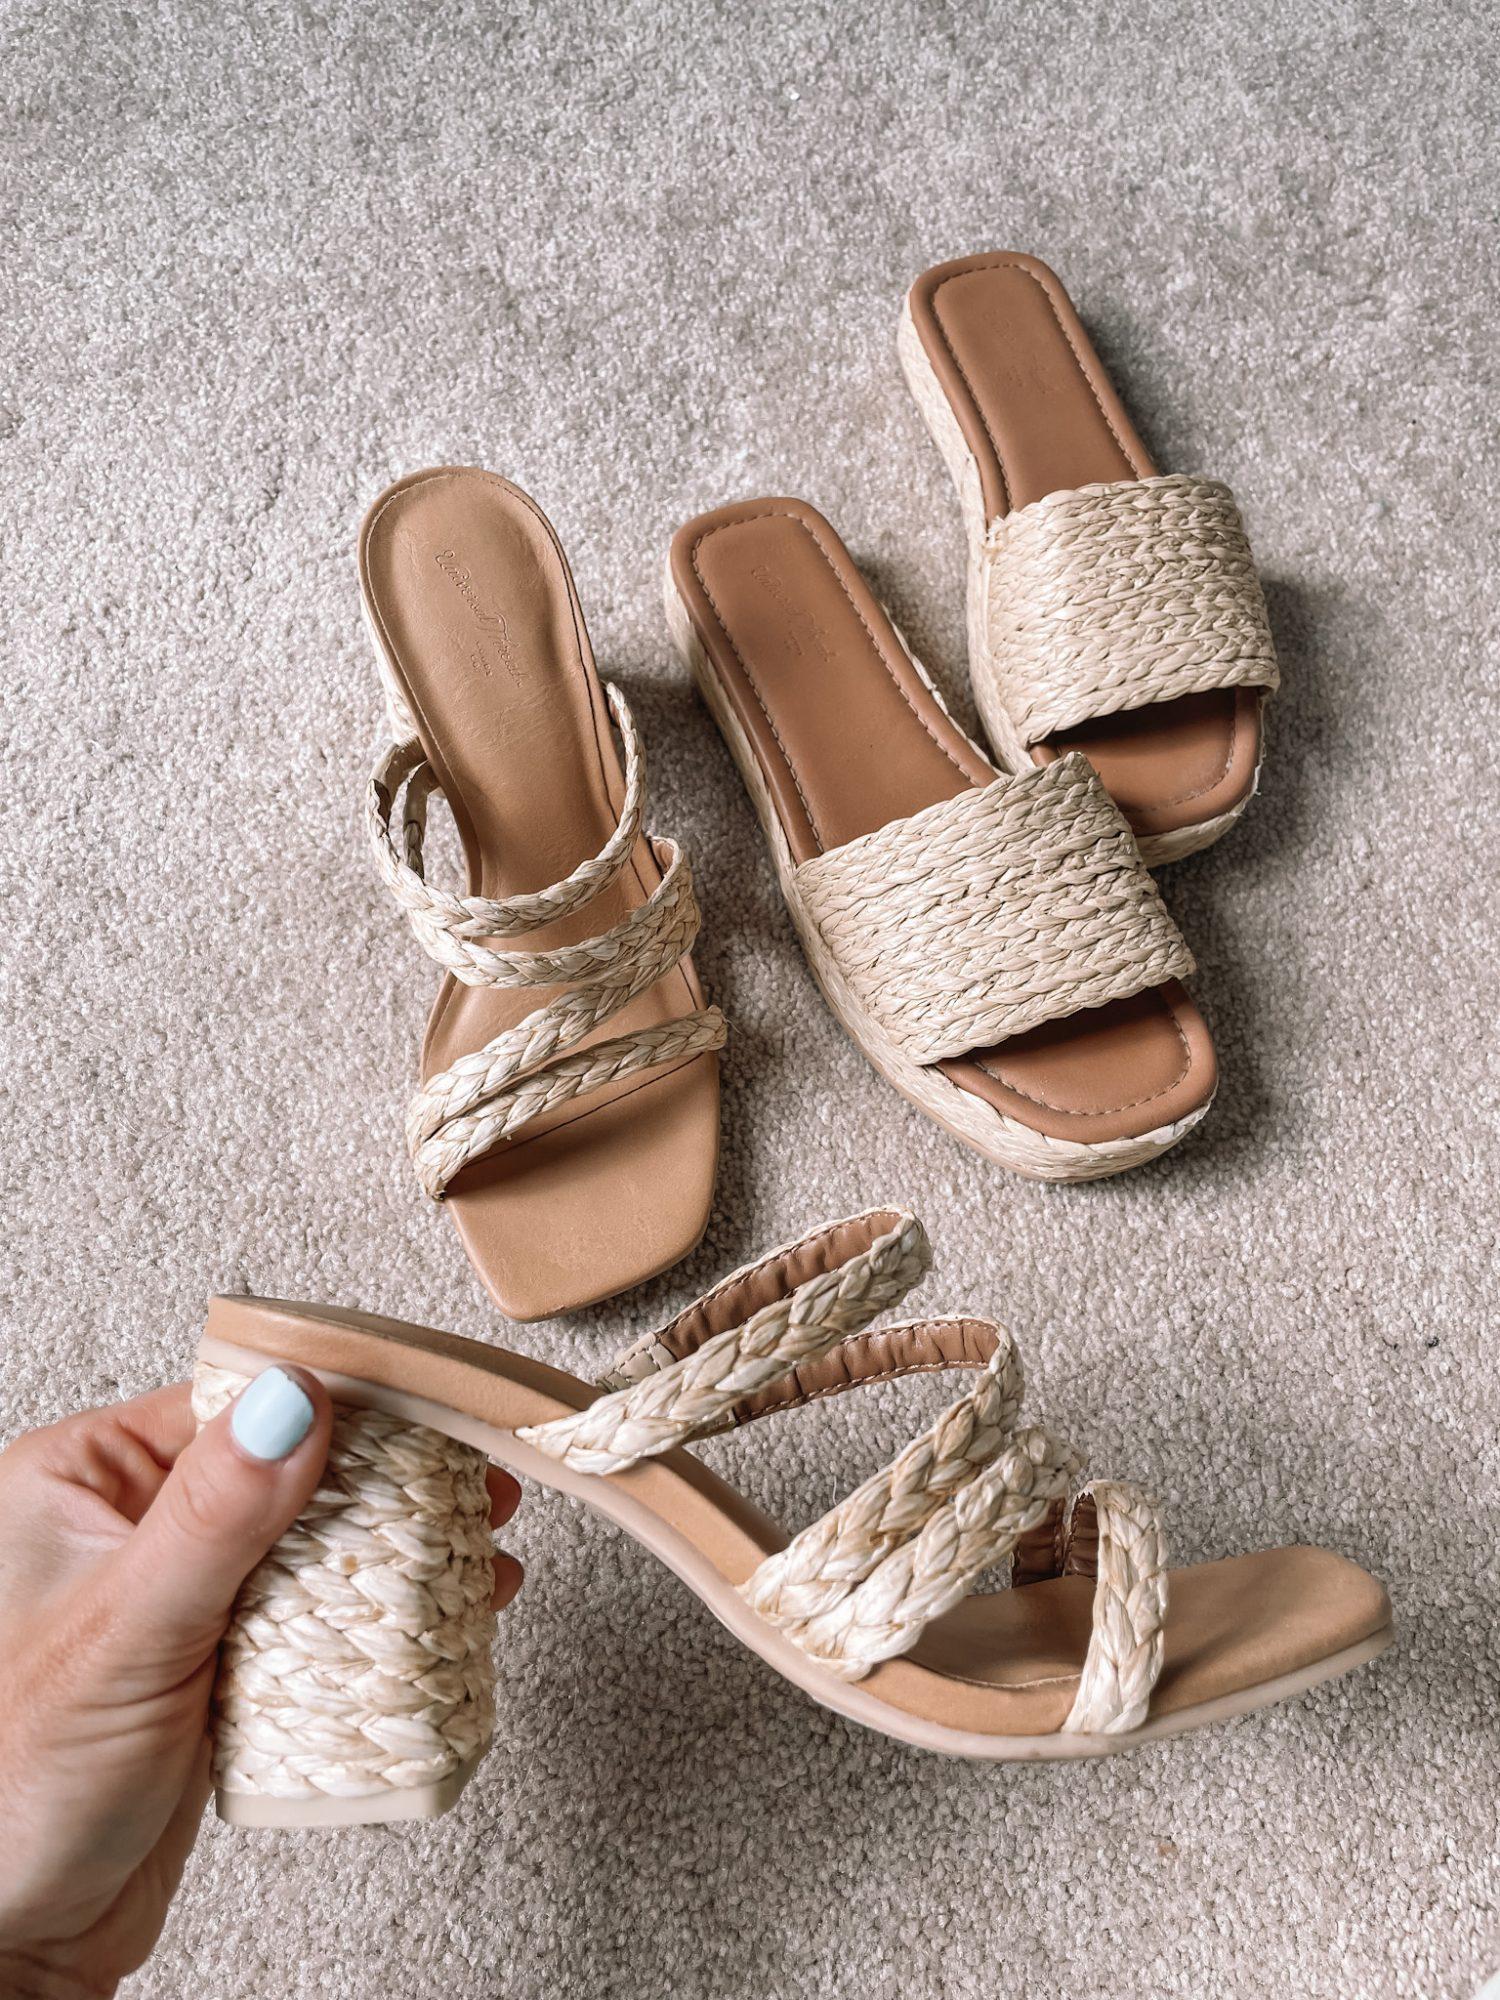 July 2021 Favorites - Afternoon Espresso- Ashley Pletcher- Affordable Shoes- Raffia heels